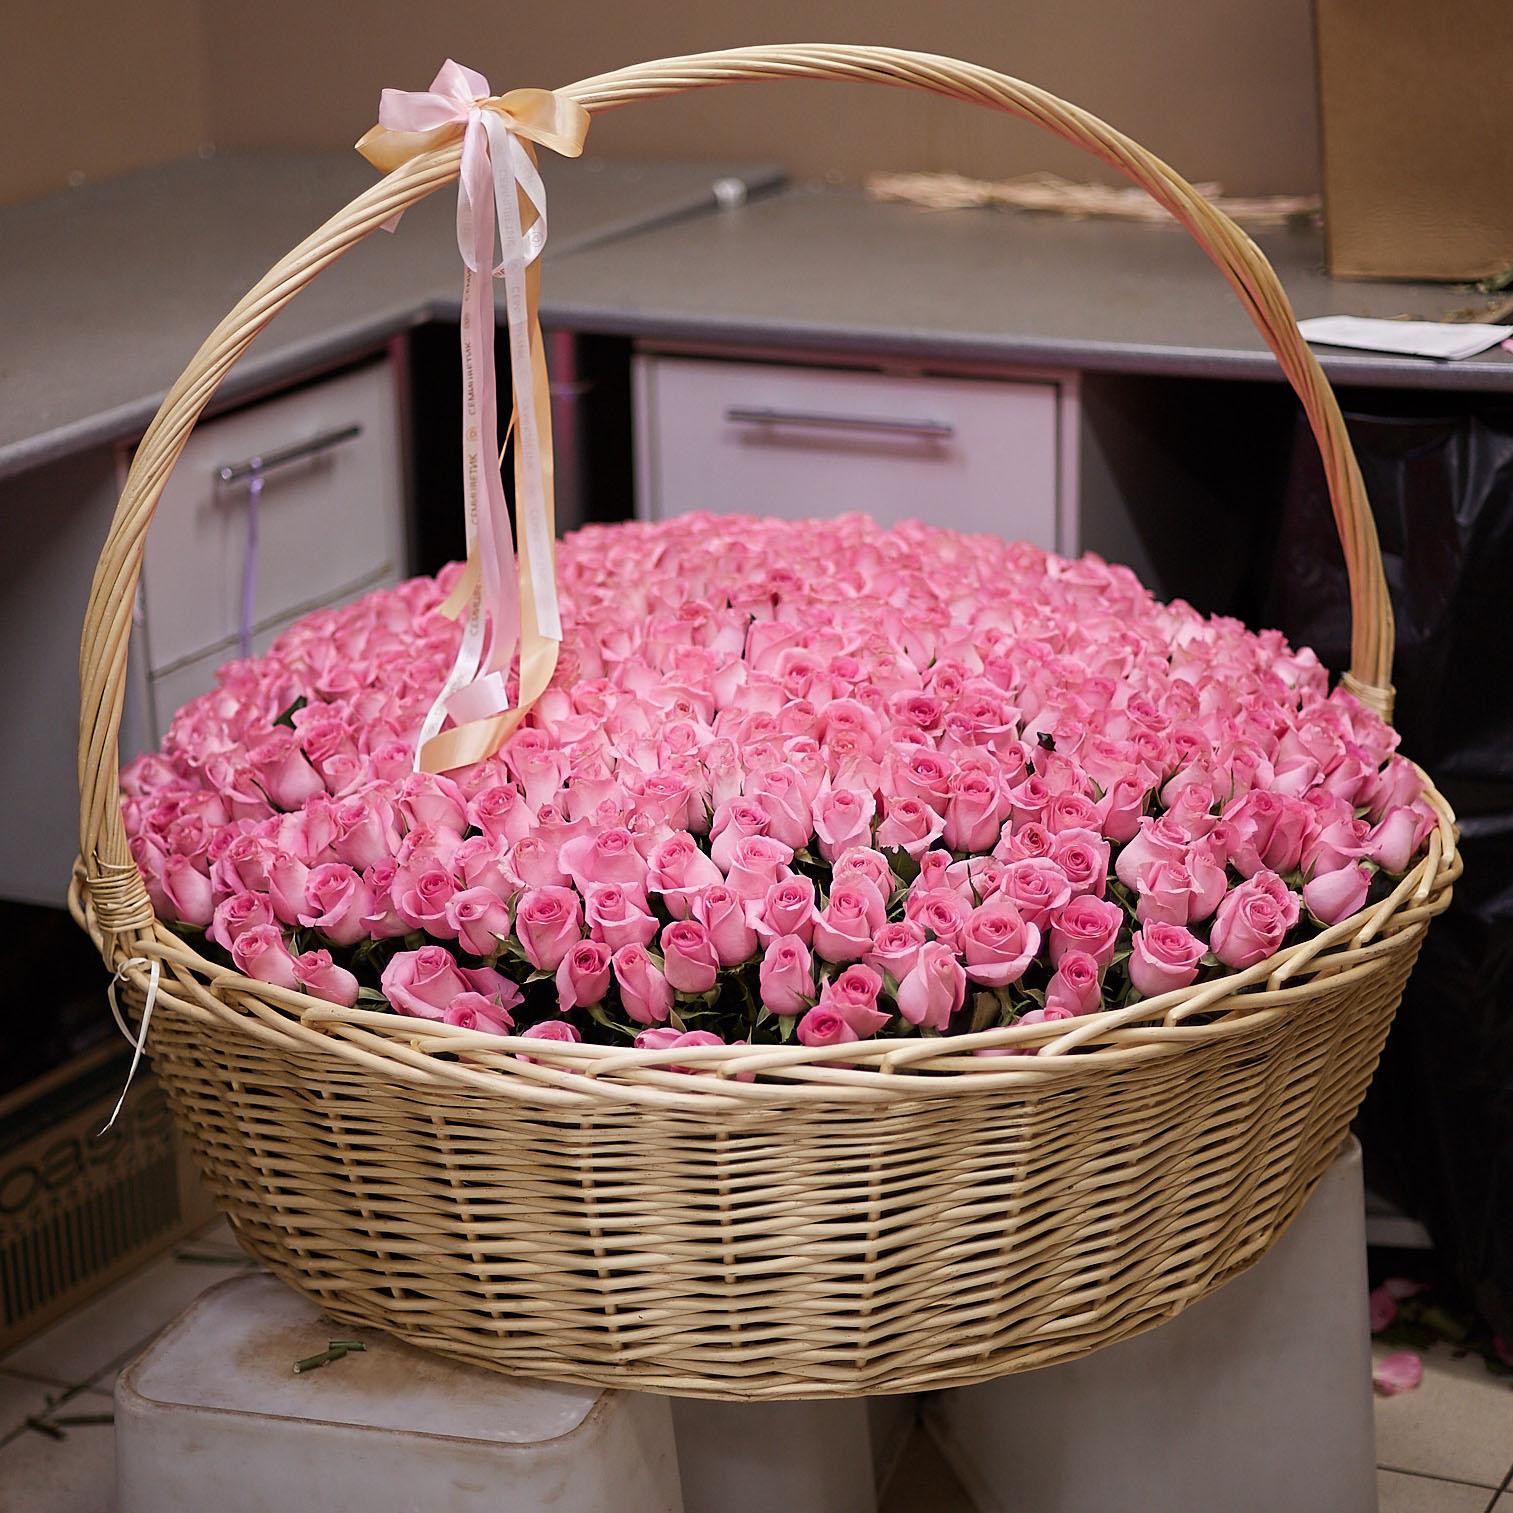 501 розовая роза Premium 40 см в корзине фото